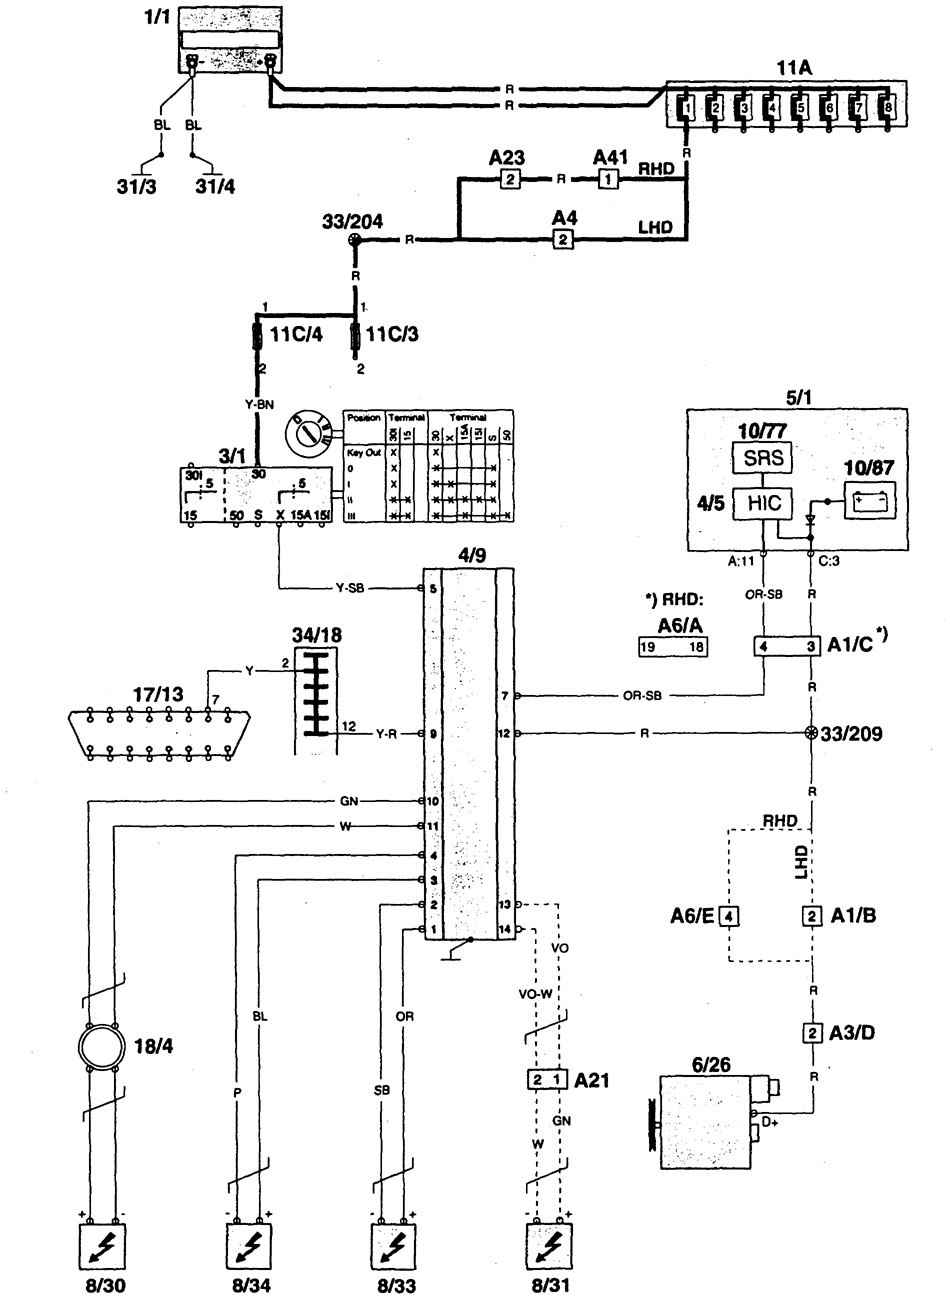 volvo roller wiring diagram volvo 960 (1997) - wiring diagrams - air bags - carknowledge 1997 volvo 960 wiring diagram